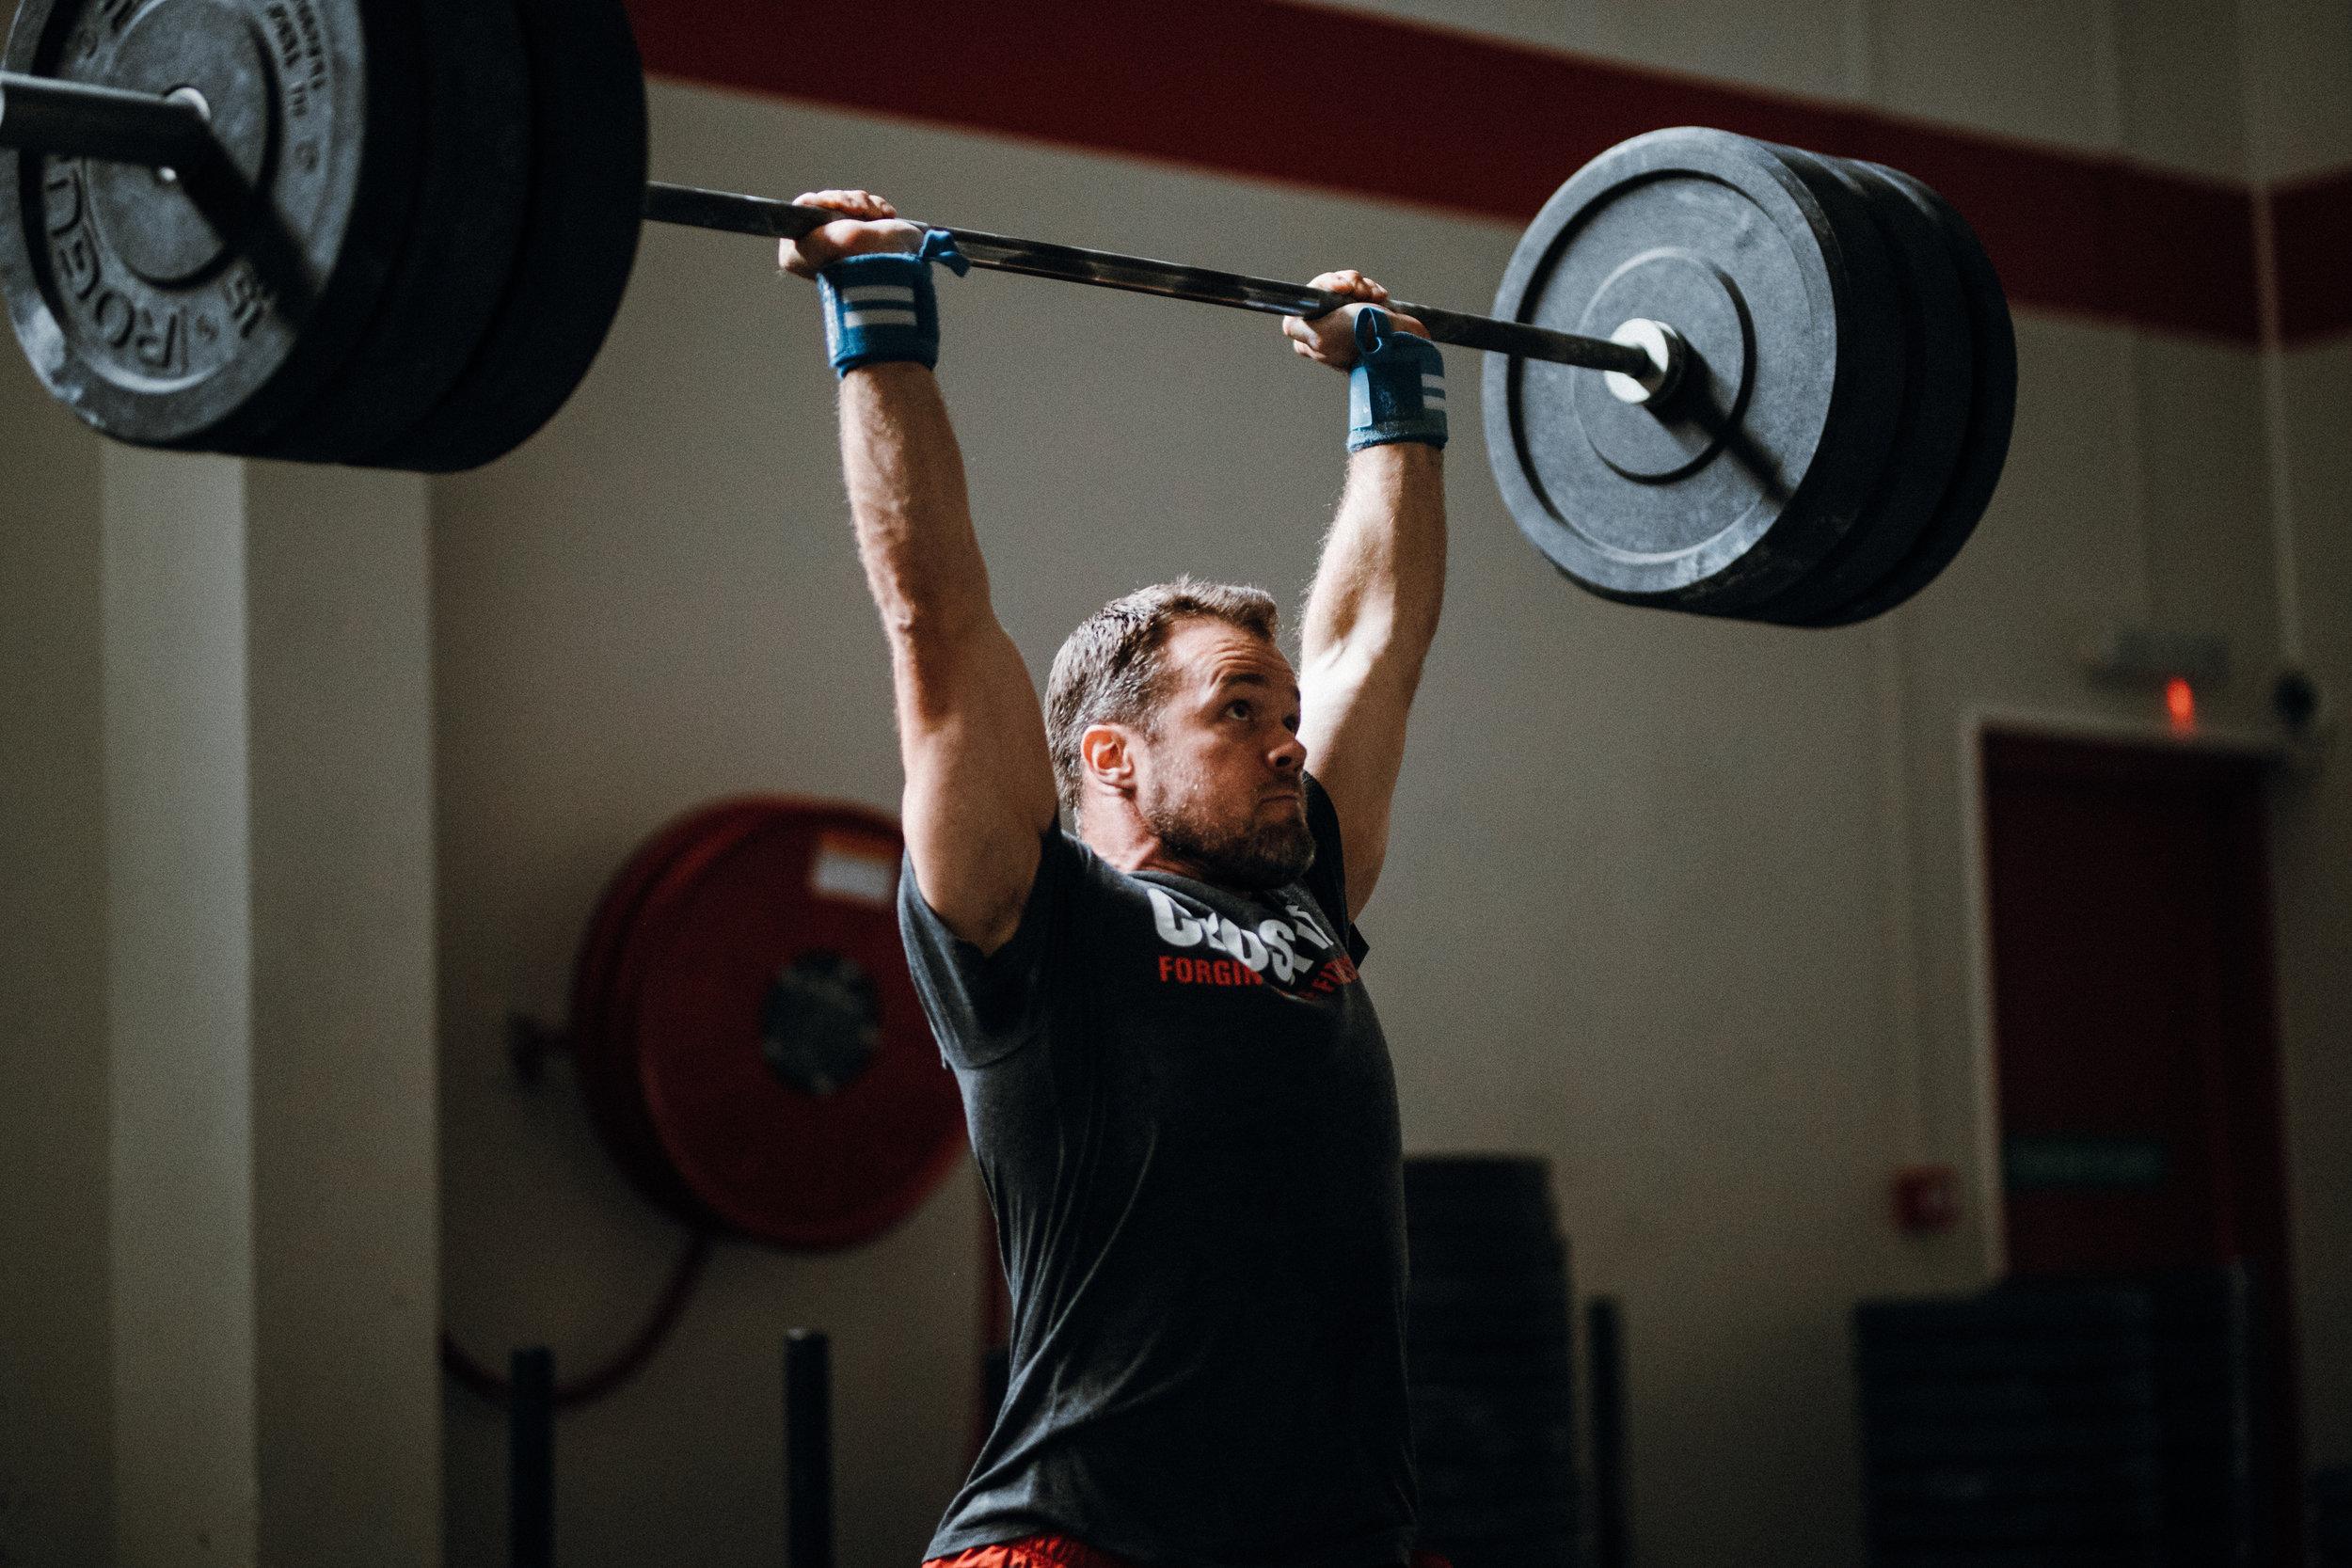 Mikko lifts